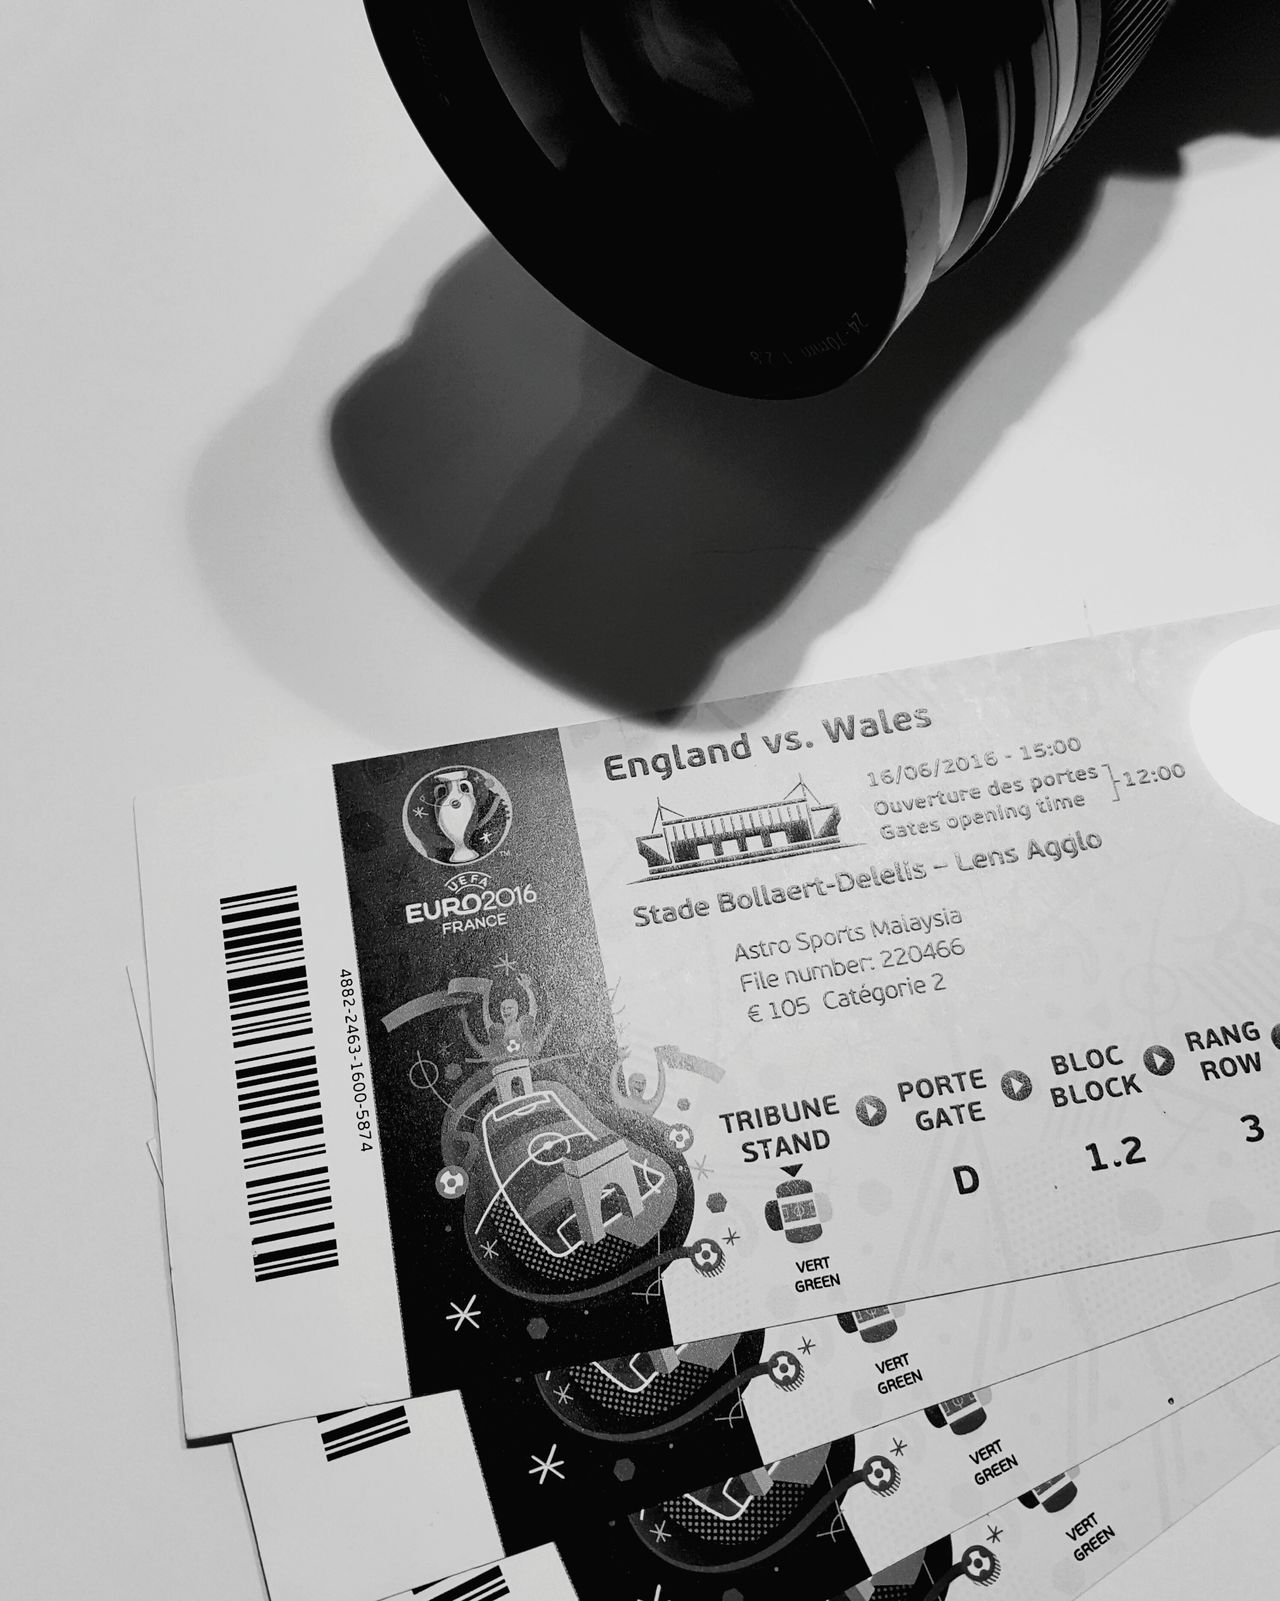 Match starting soon. UEFA EURO 2016 Engvswales France 🇫🇷 Lens